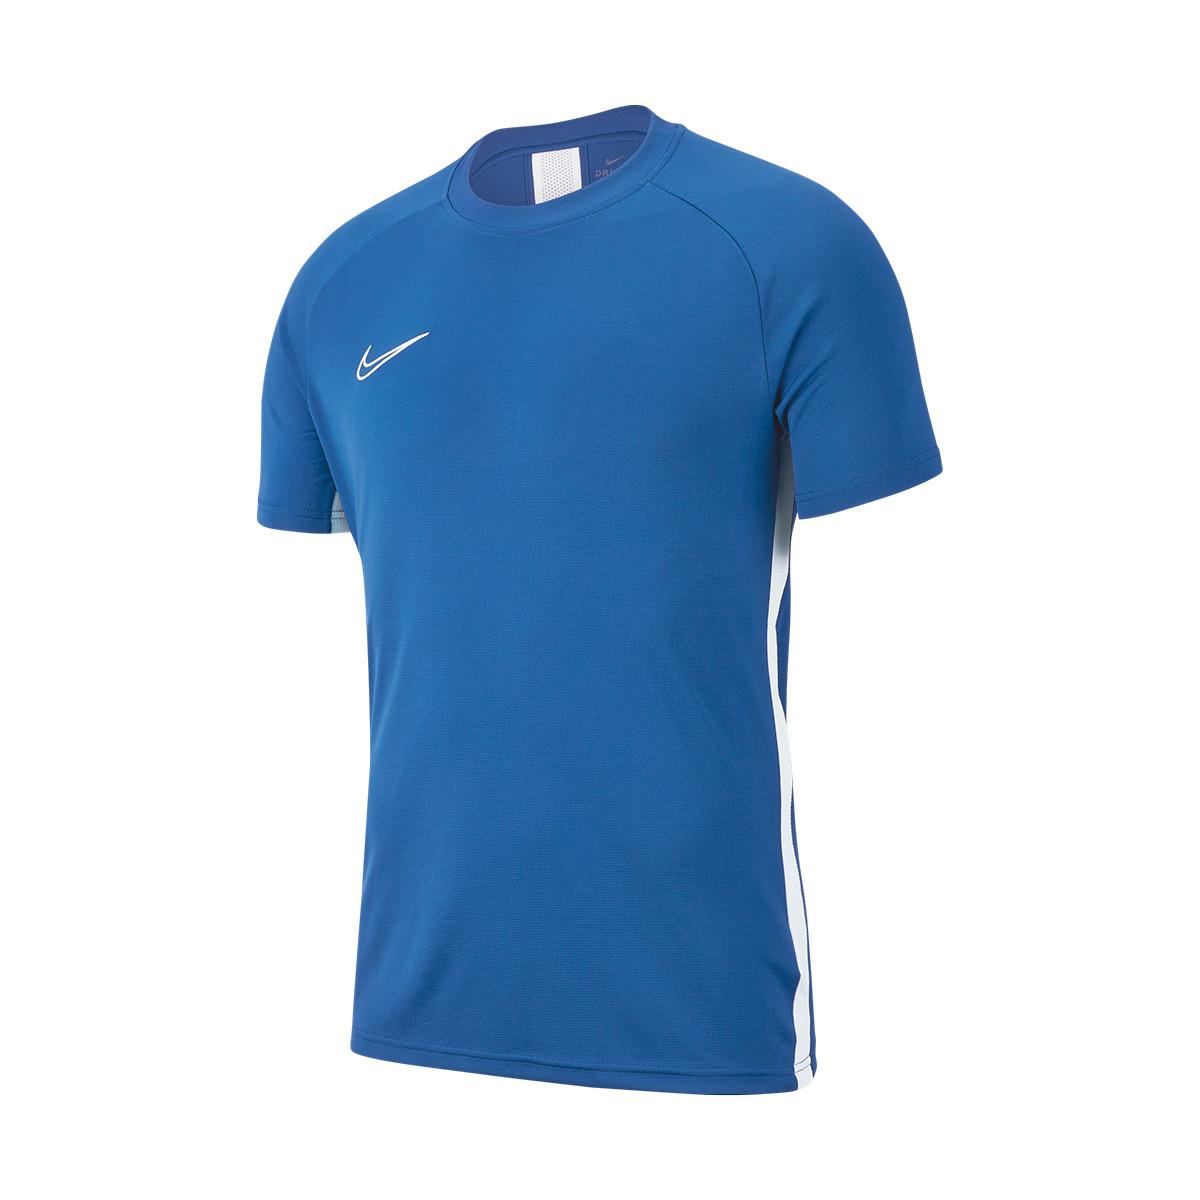 Academia labio Celsius  Camiseta Nike Academy 19 Training Top Niño Marina-White - Tienda de fútbol  Fútbol Emotion